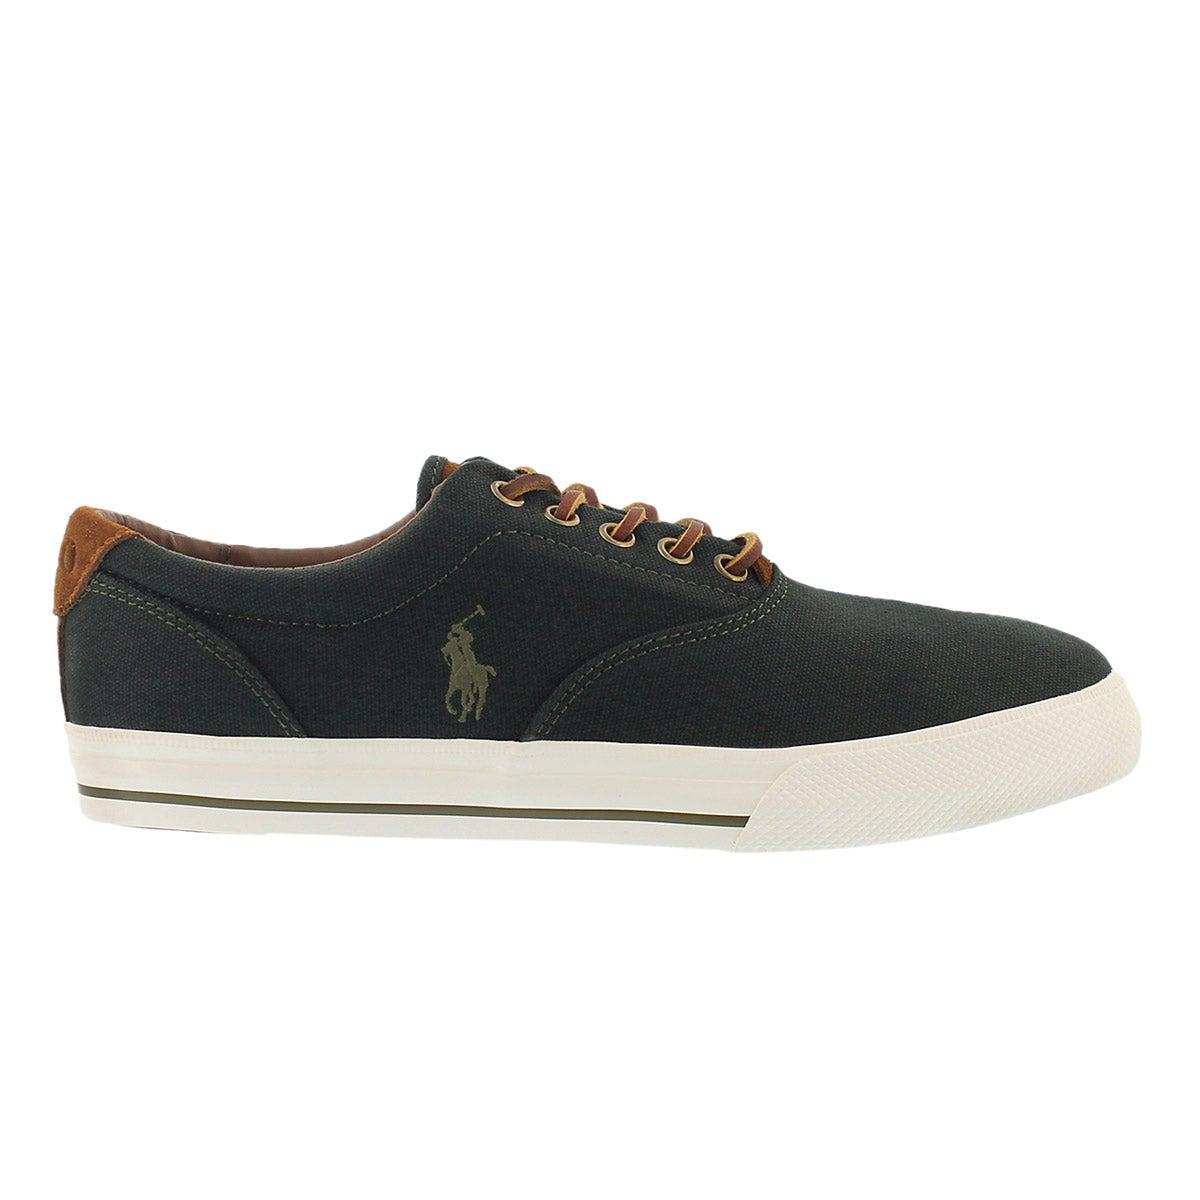 Mns Vaughn alpine green cnvs/sde sneaker